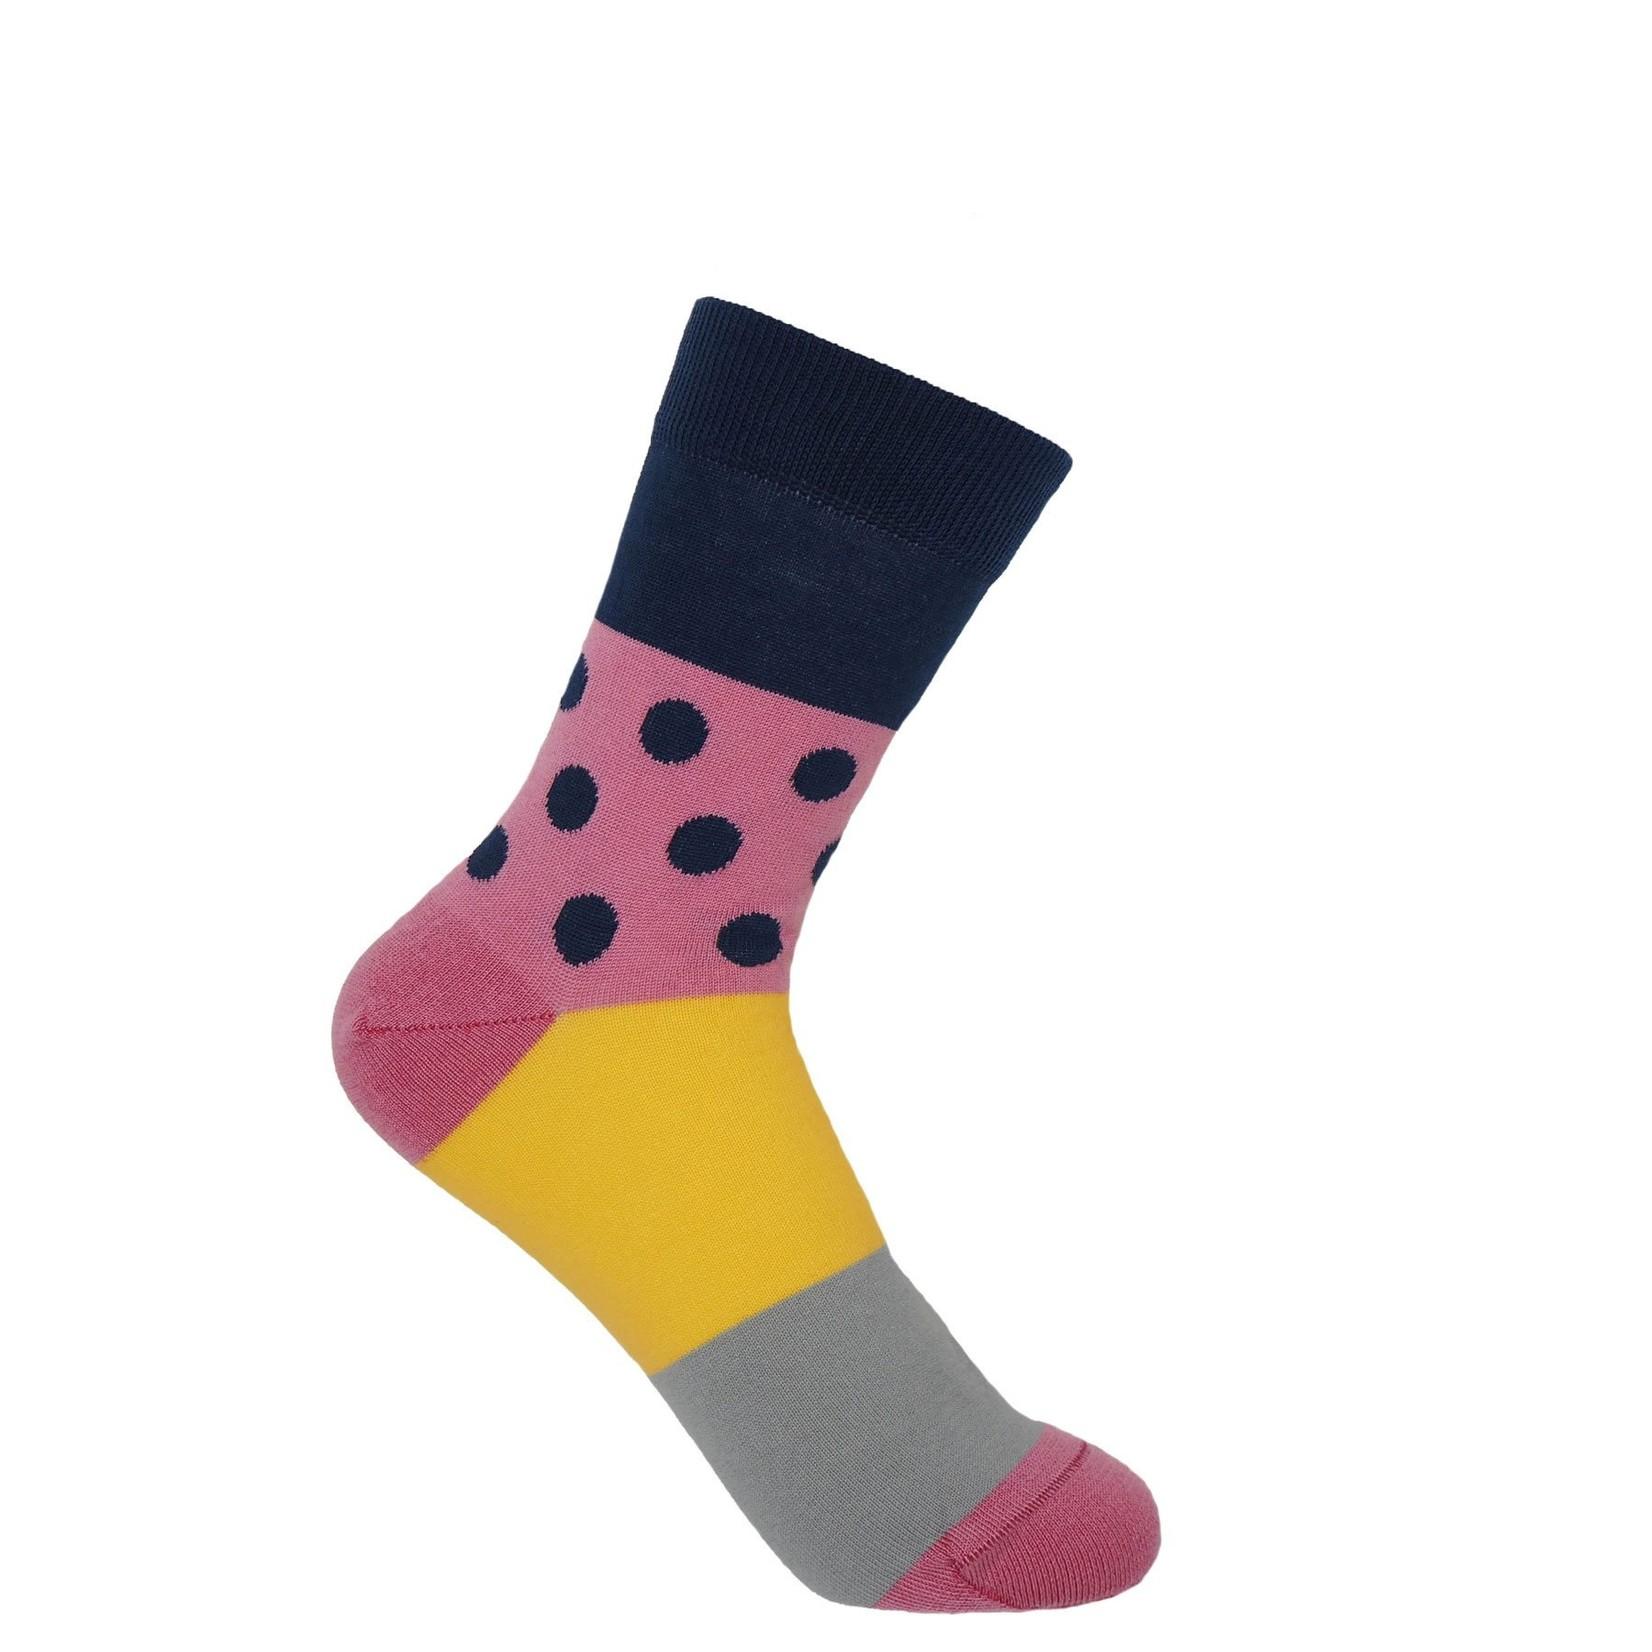 Peper Harow Mayfair Socks Navy